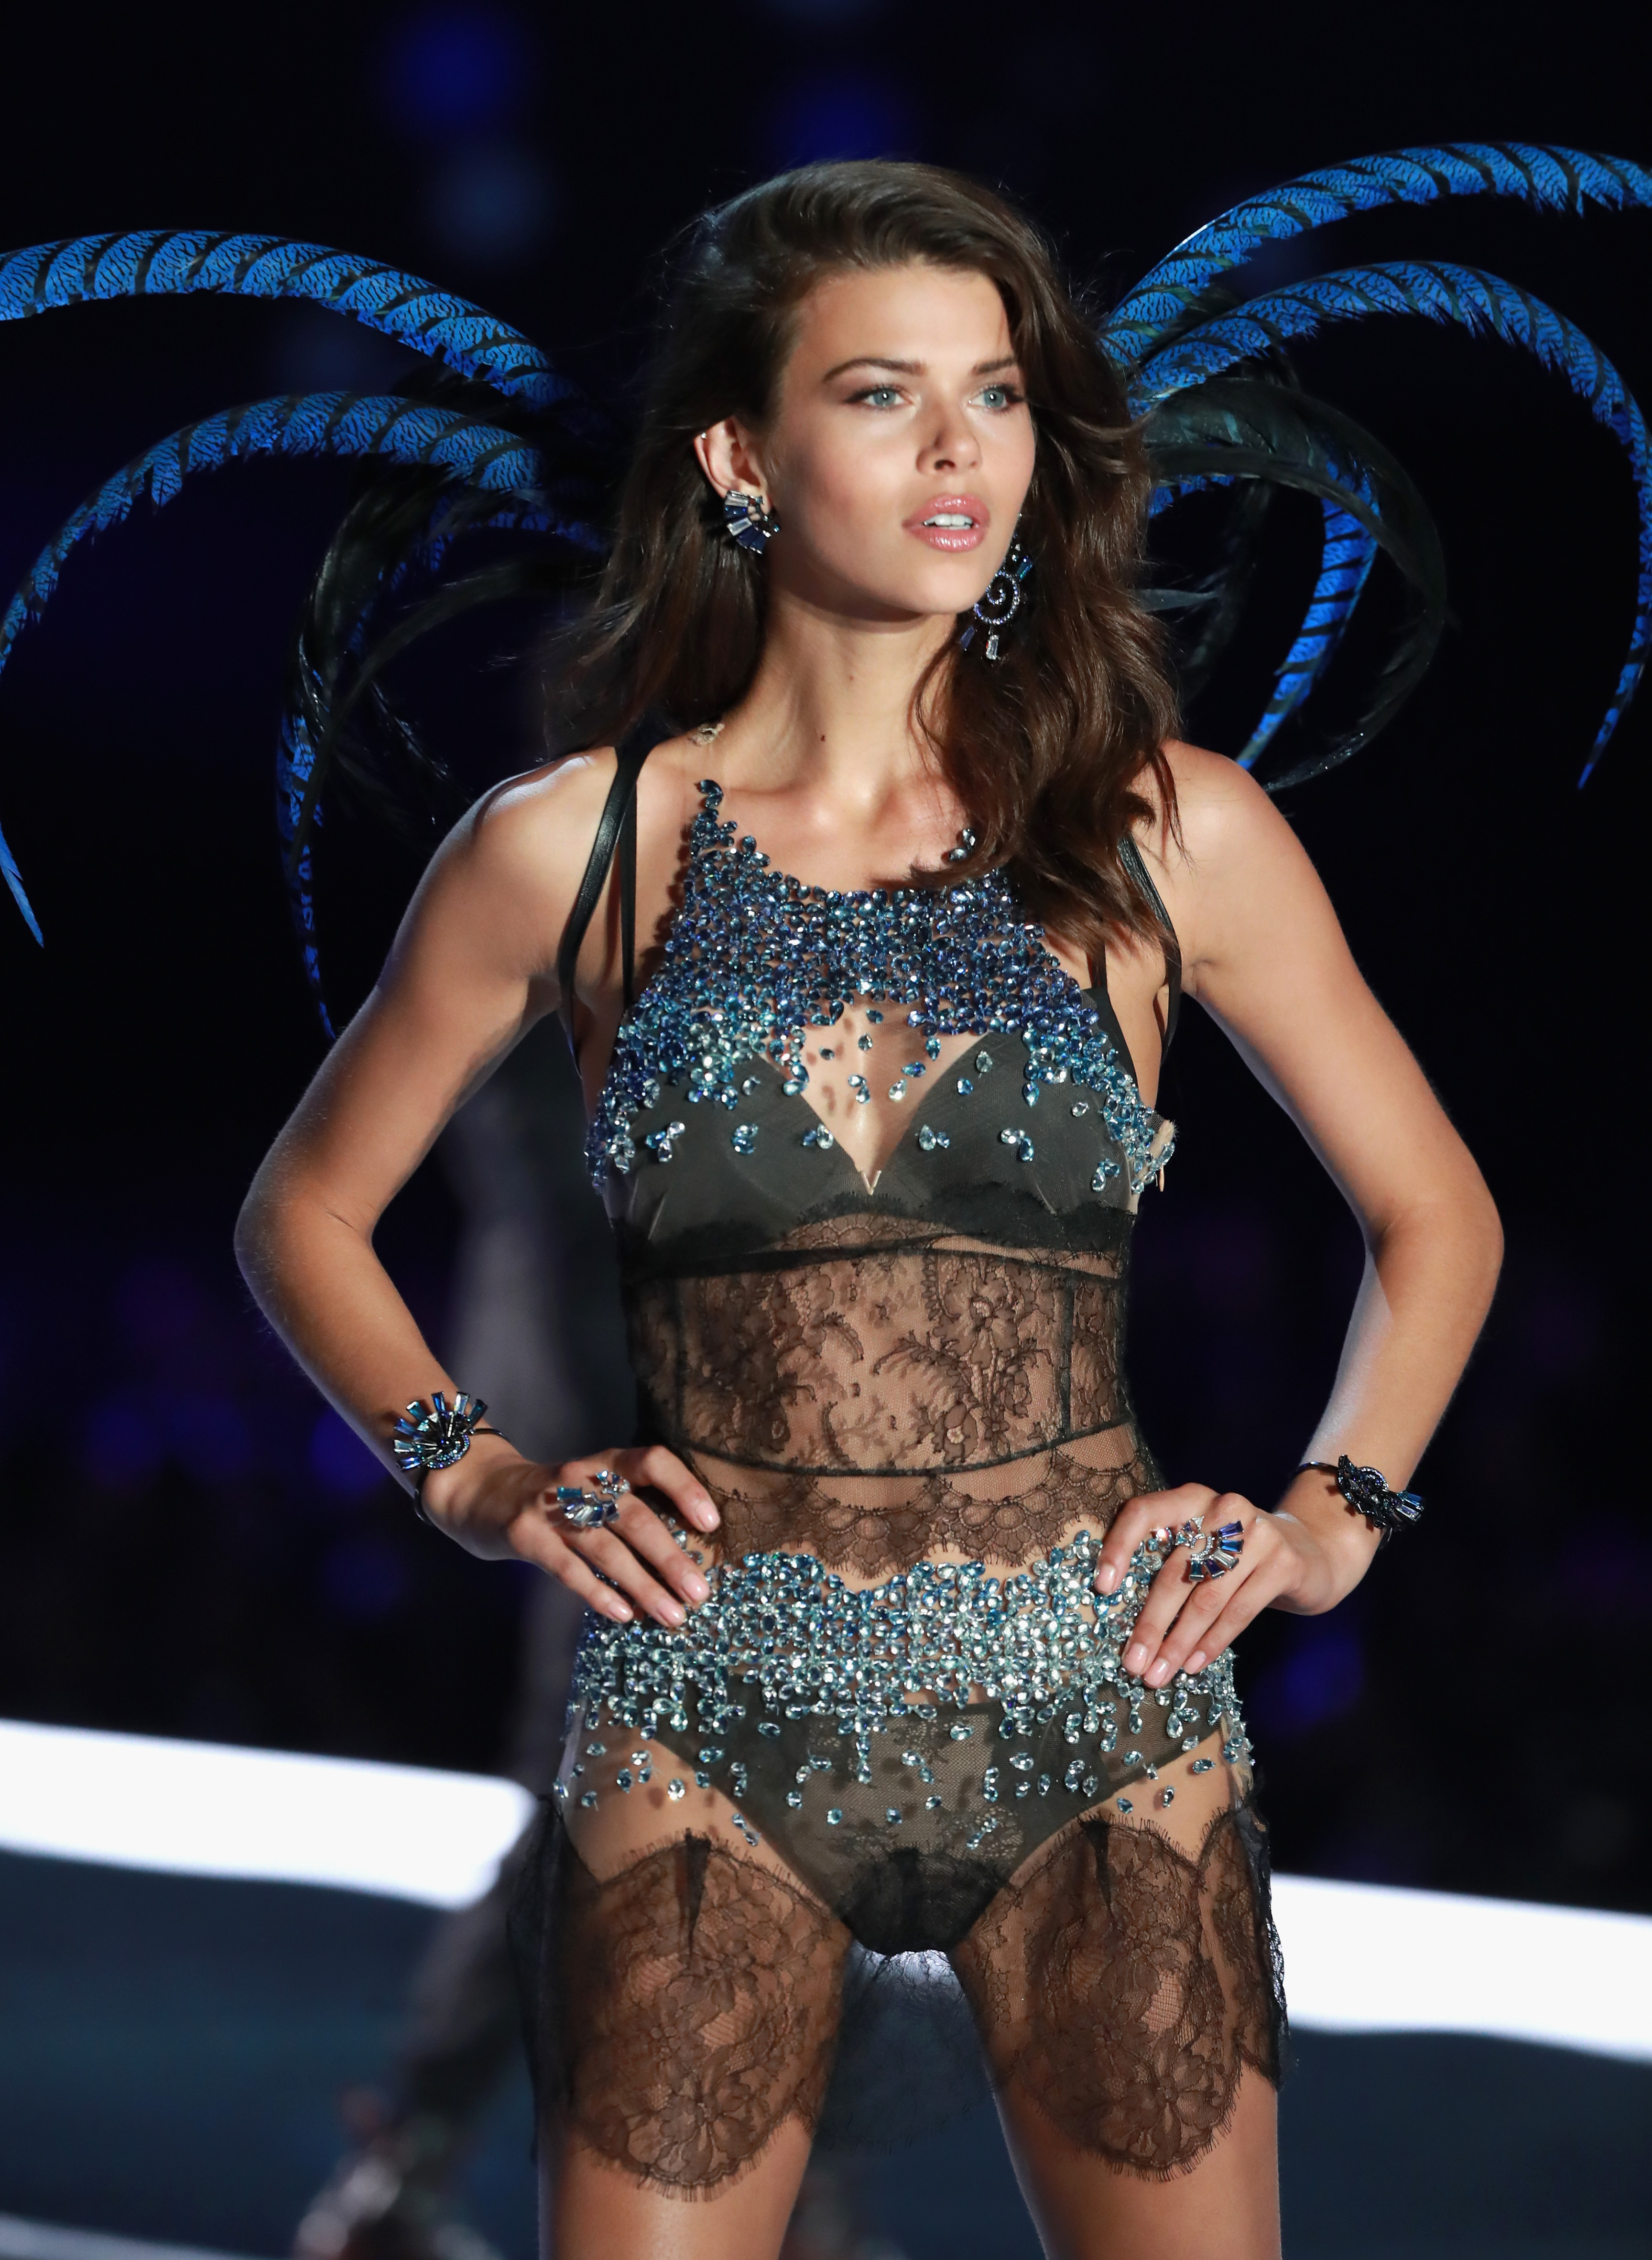 Victoria's Secret Models Harry Styles Has Dated, which victoria's secret angels has harry styles dated, harry styles model girlfriends